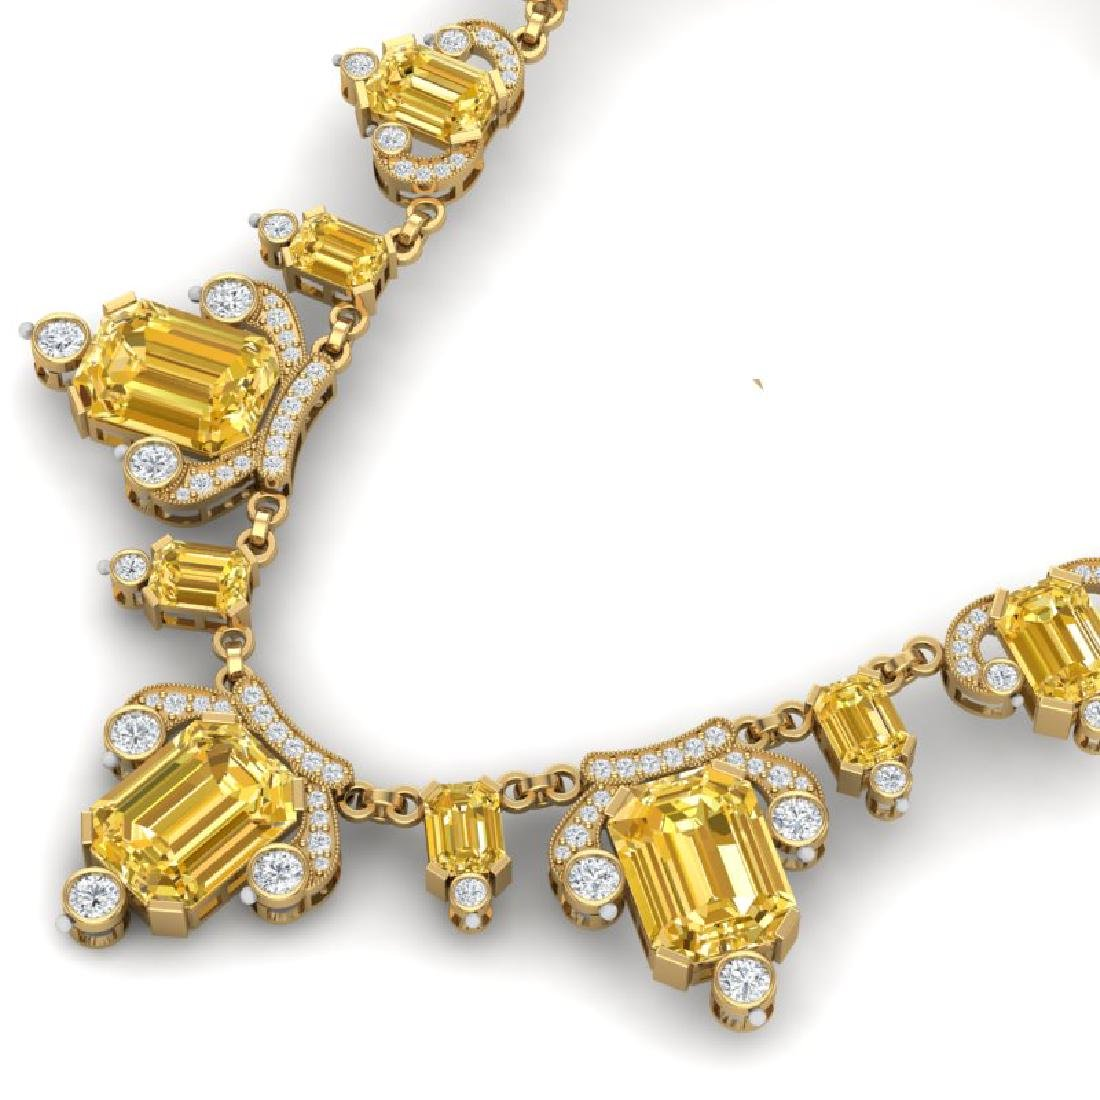 71.48 CTW Royalty Canary Citrine & VS Diamond Necklace - 2